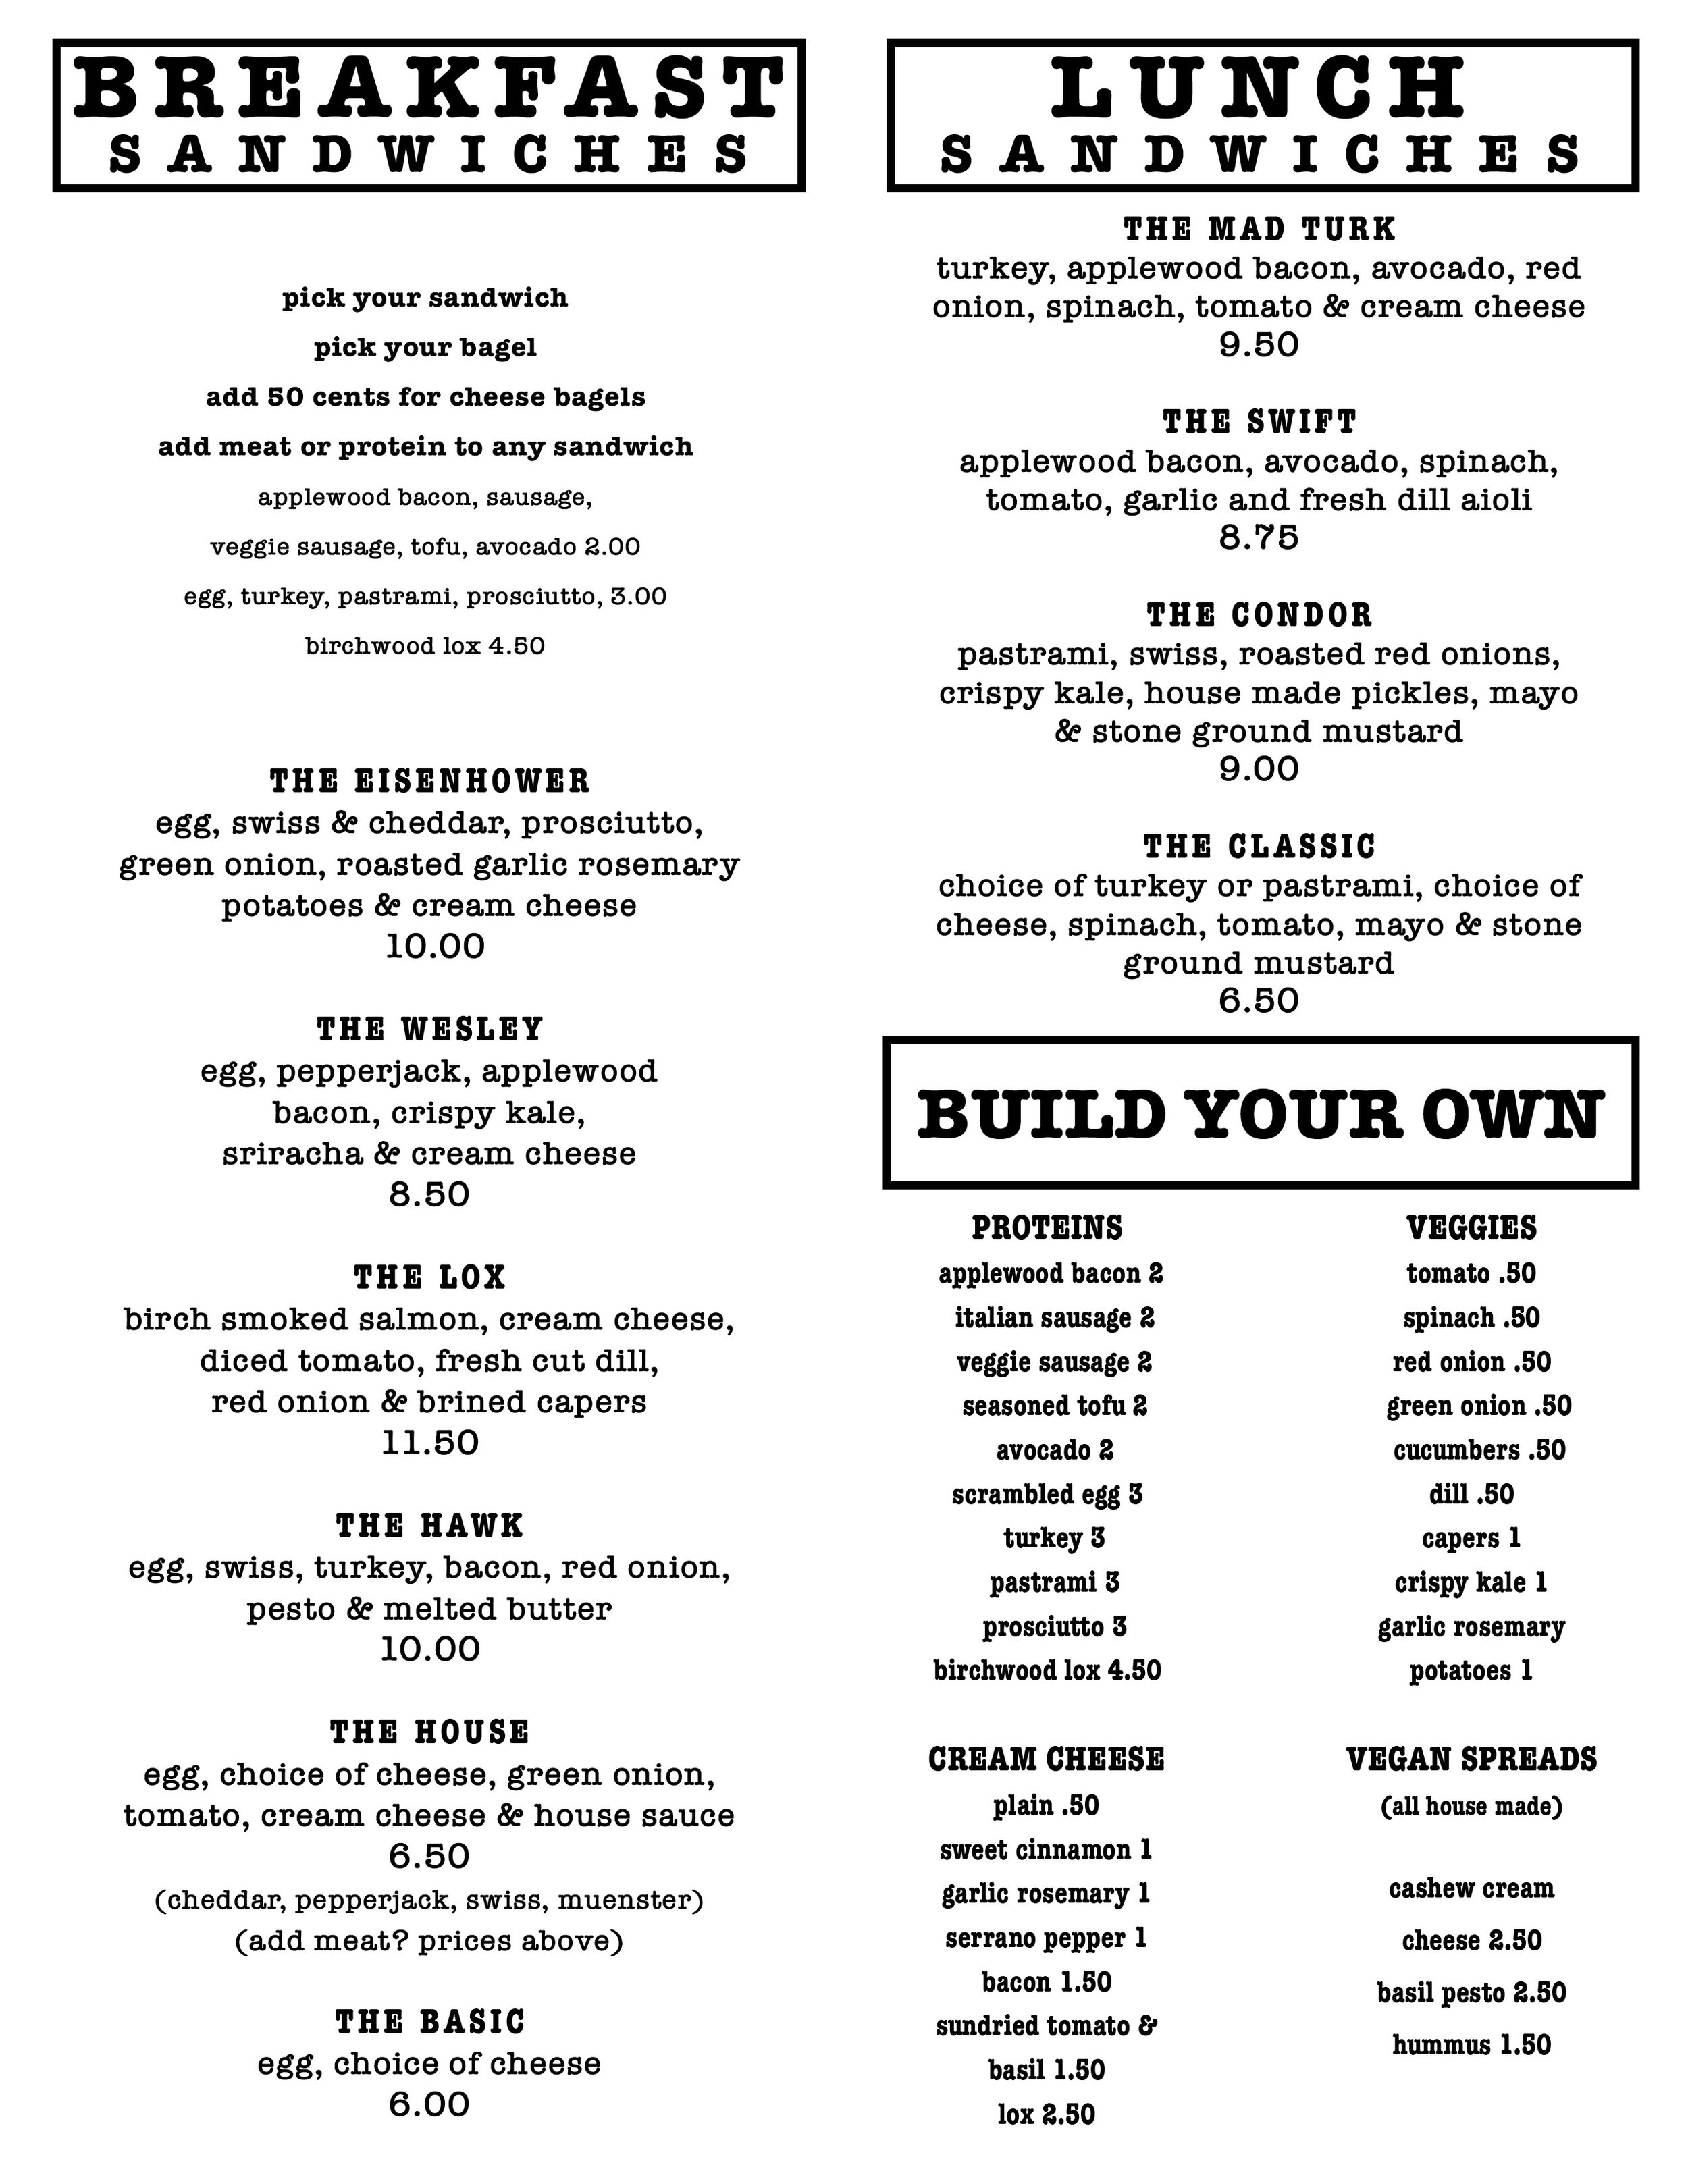 bagelhouse counter menu 4:192.jpg